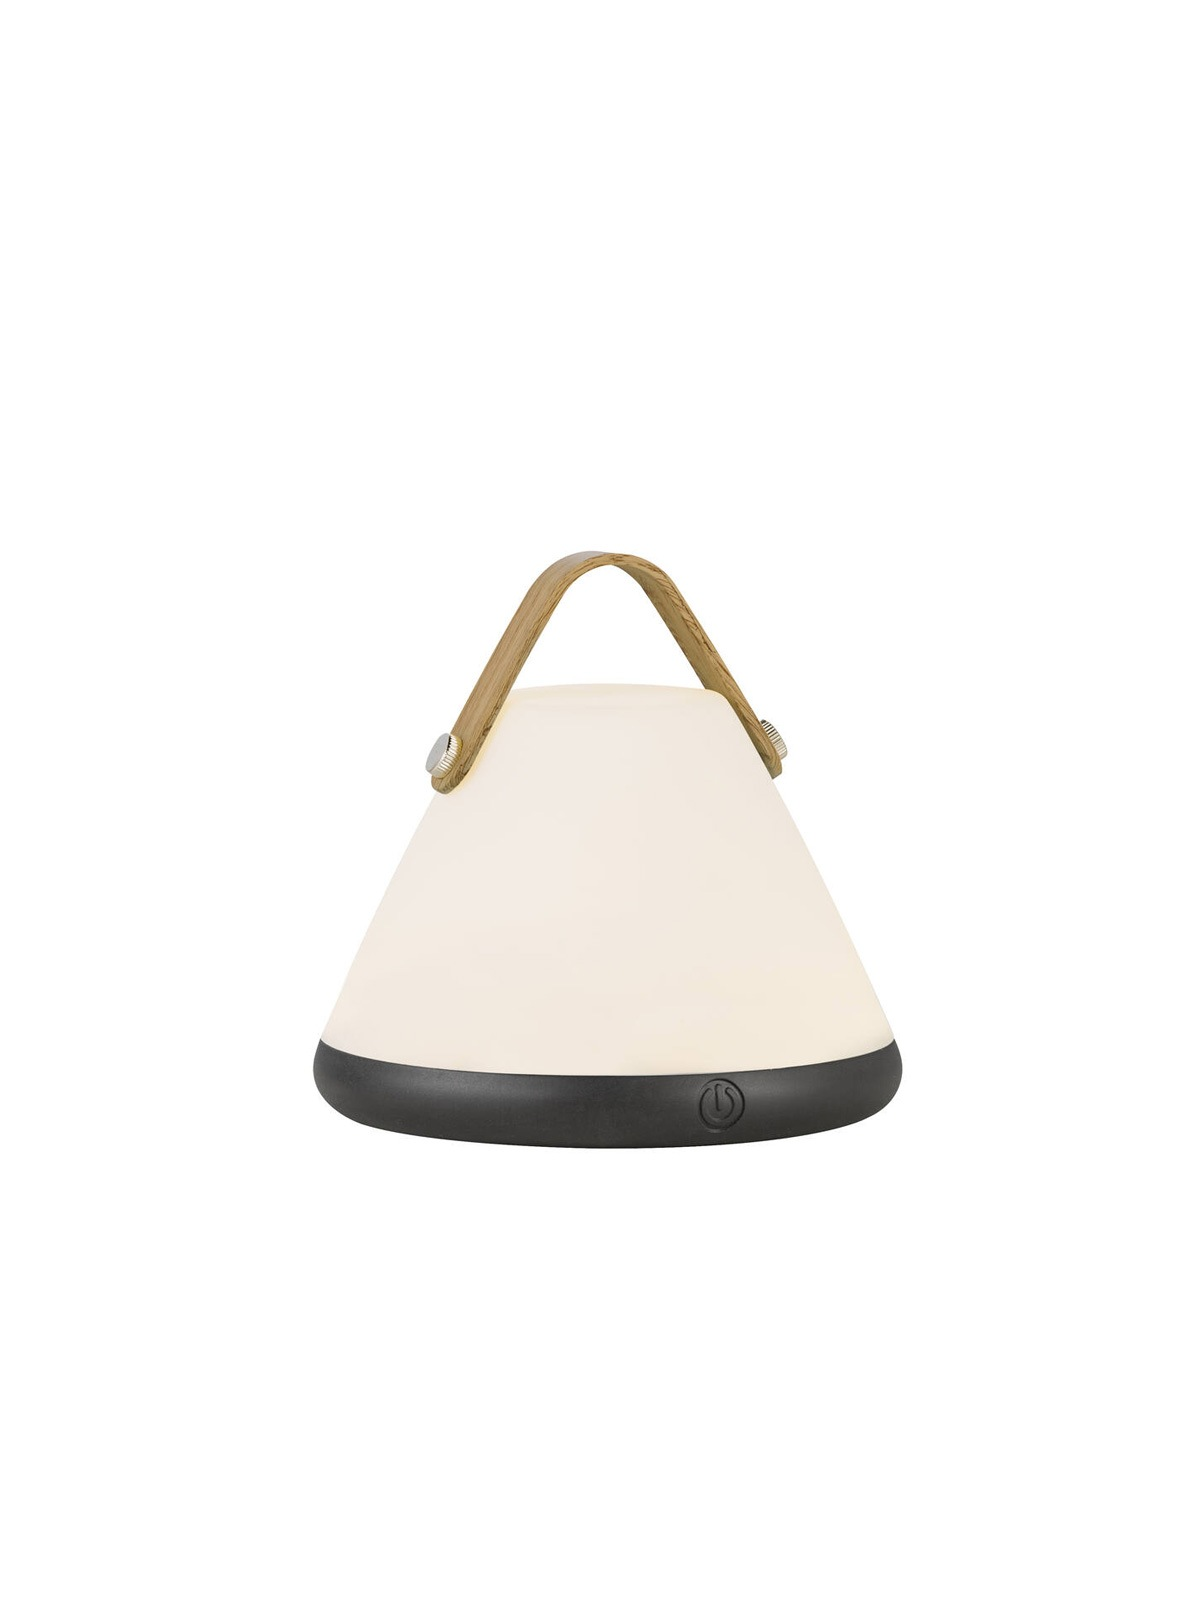 Strap Batterie tragbare Lampe Design for the People Nordlux DesignOrt Onlineshop Berlin